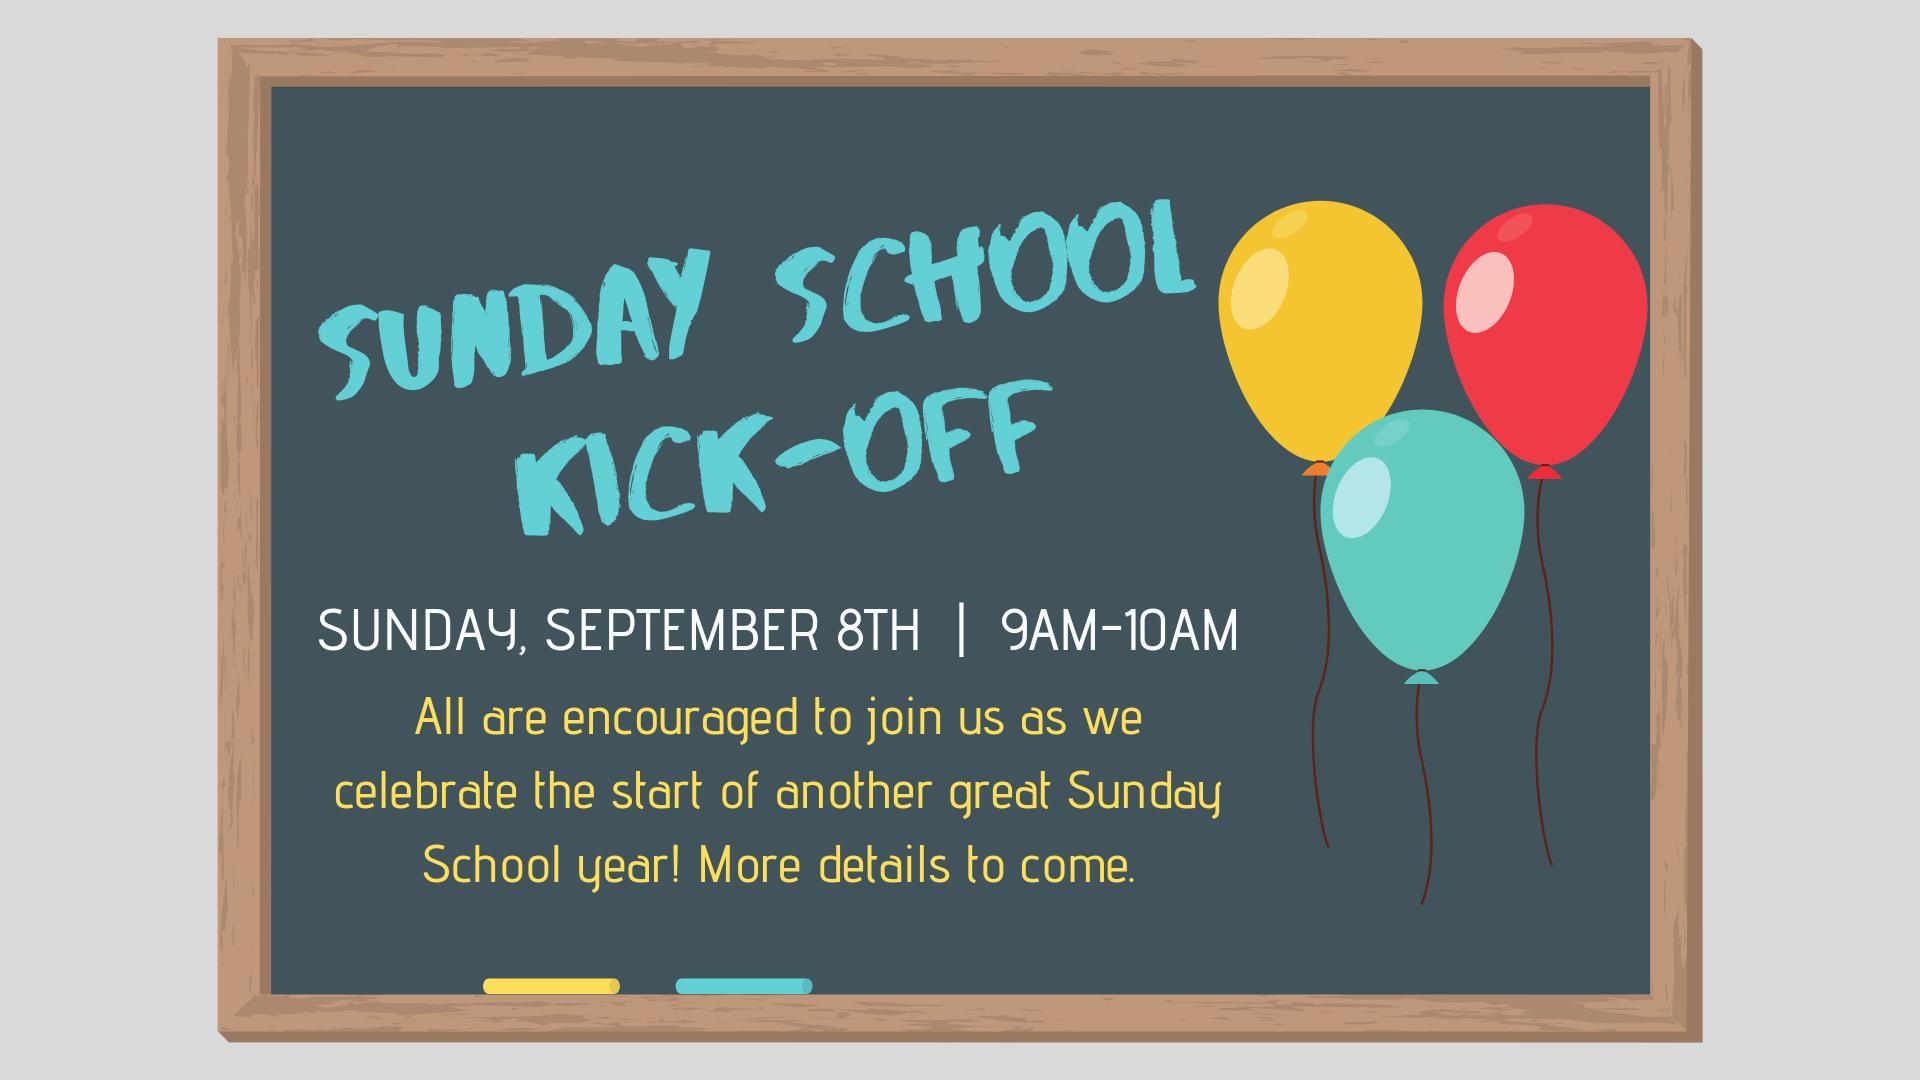 sunday school kick-off.png